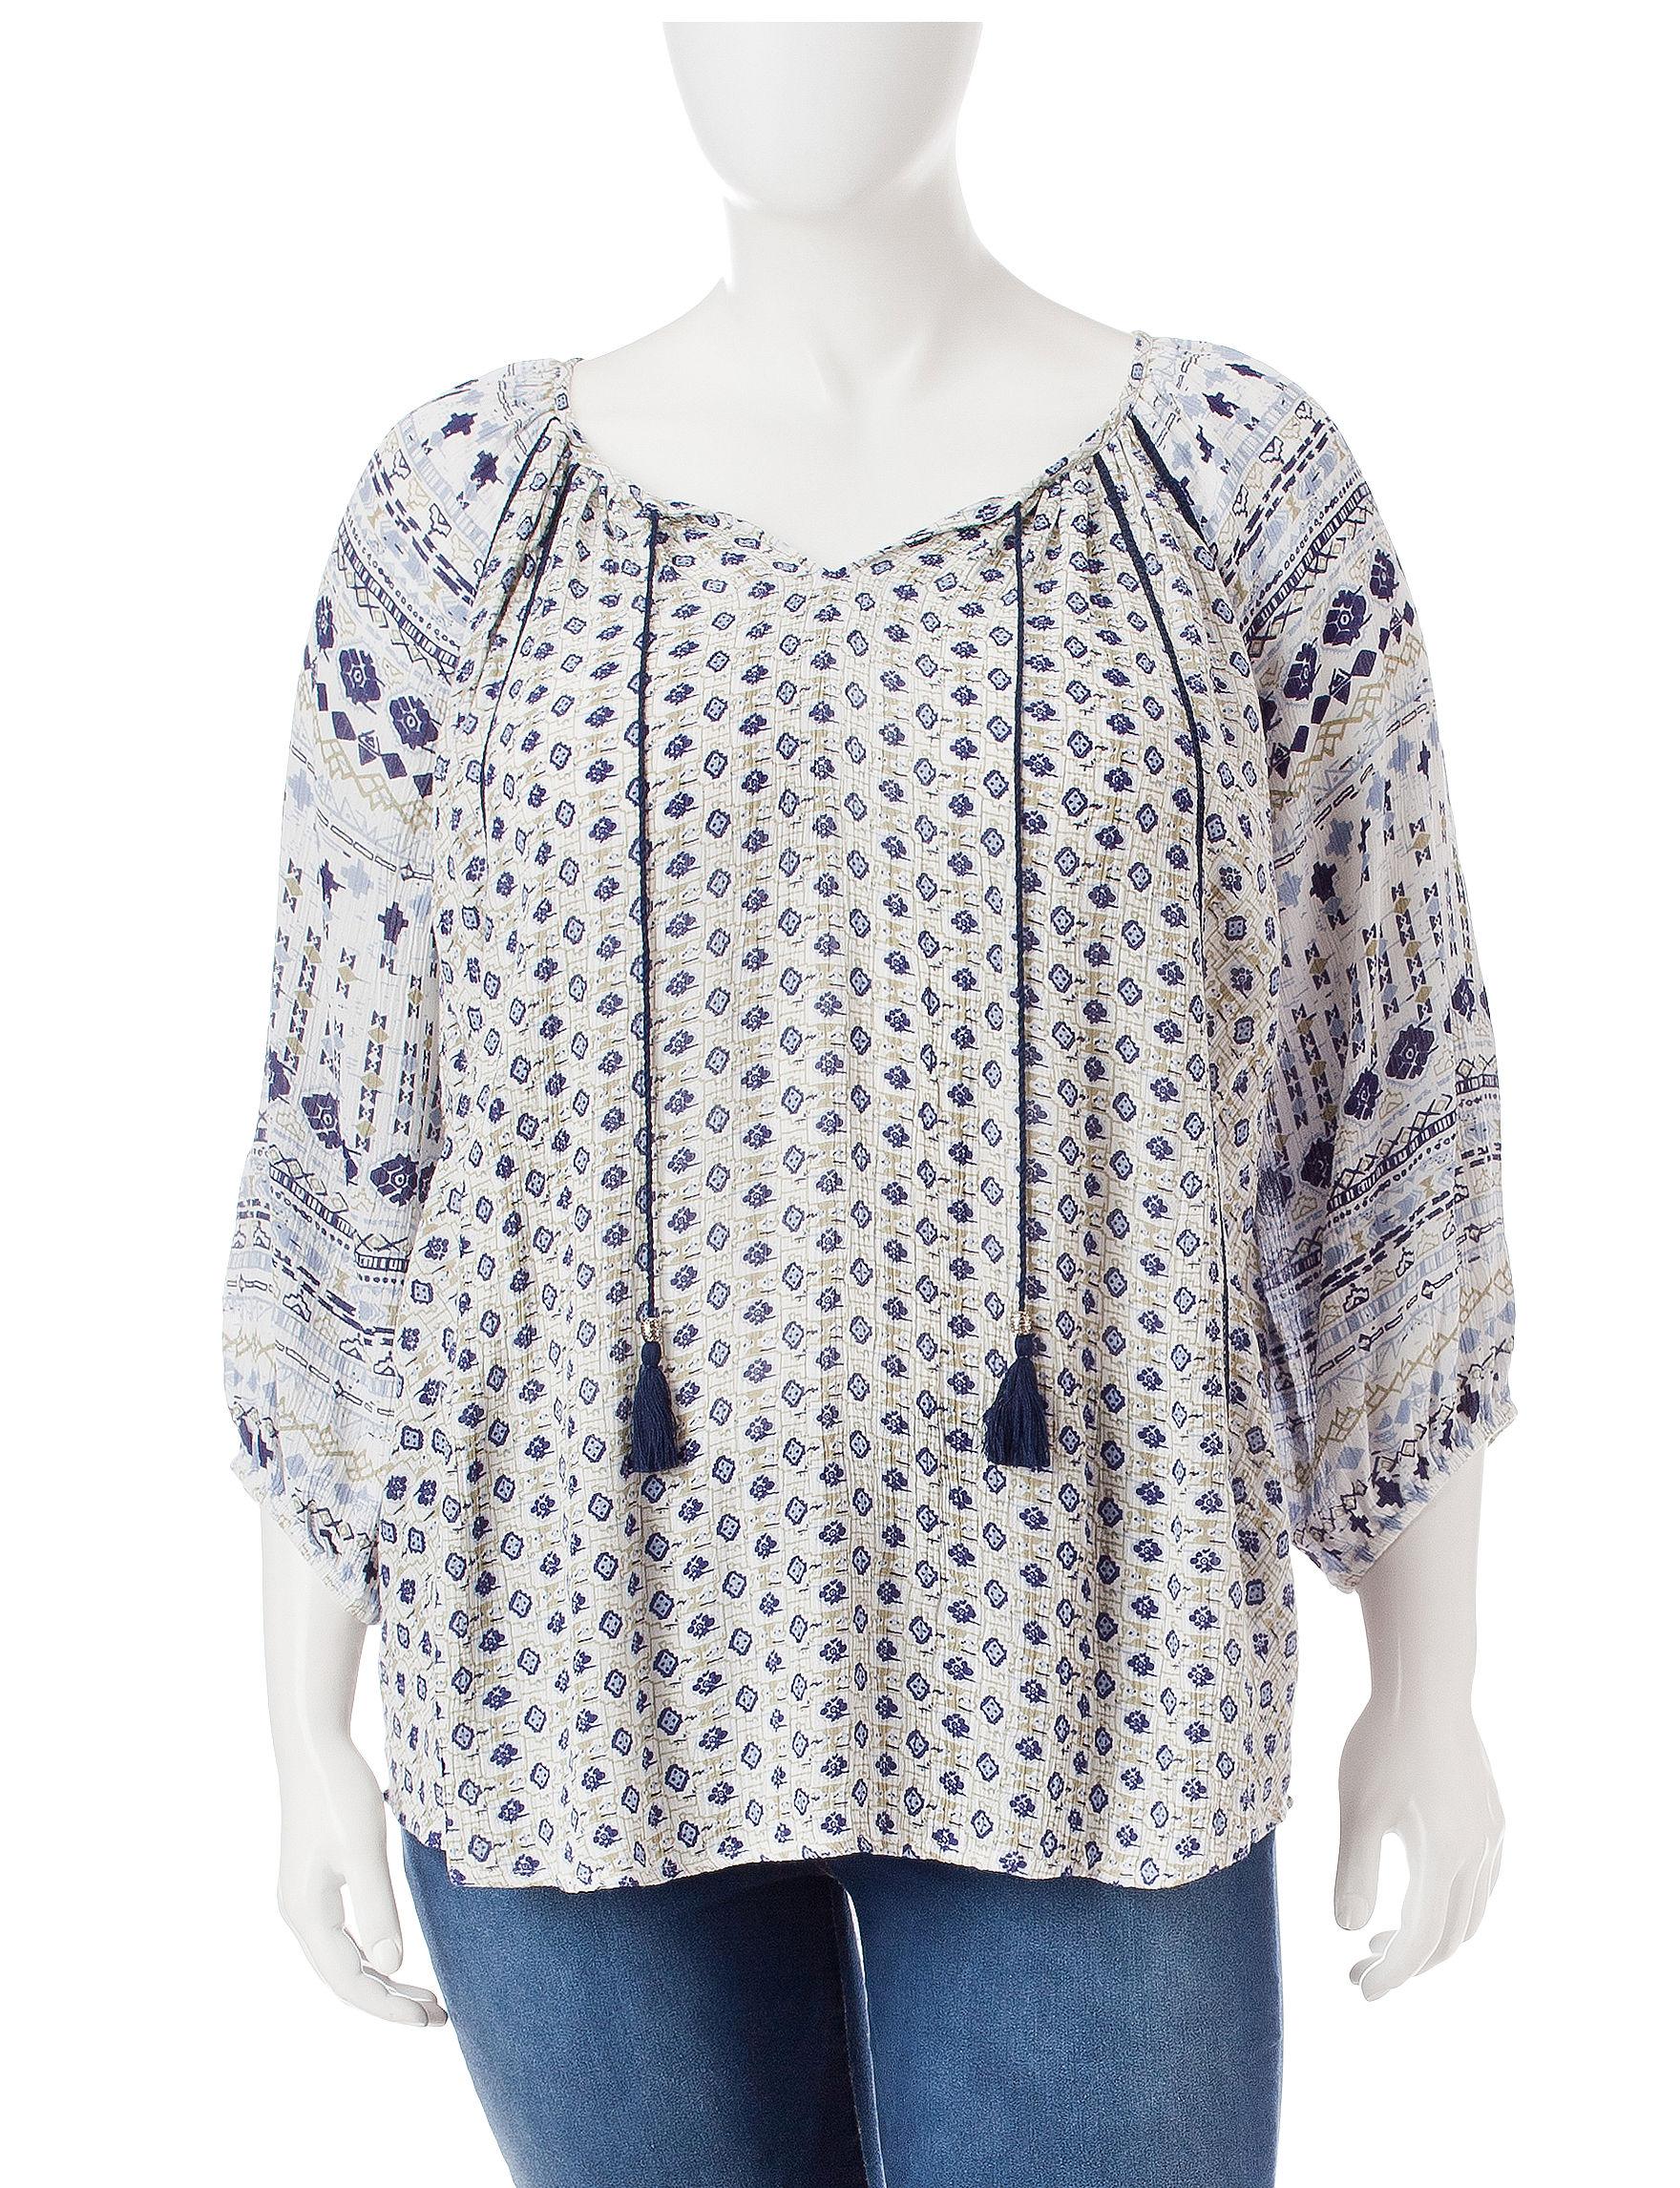 Hannah Blue Multi Shirts & Blouses